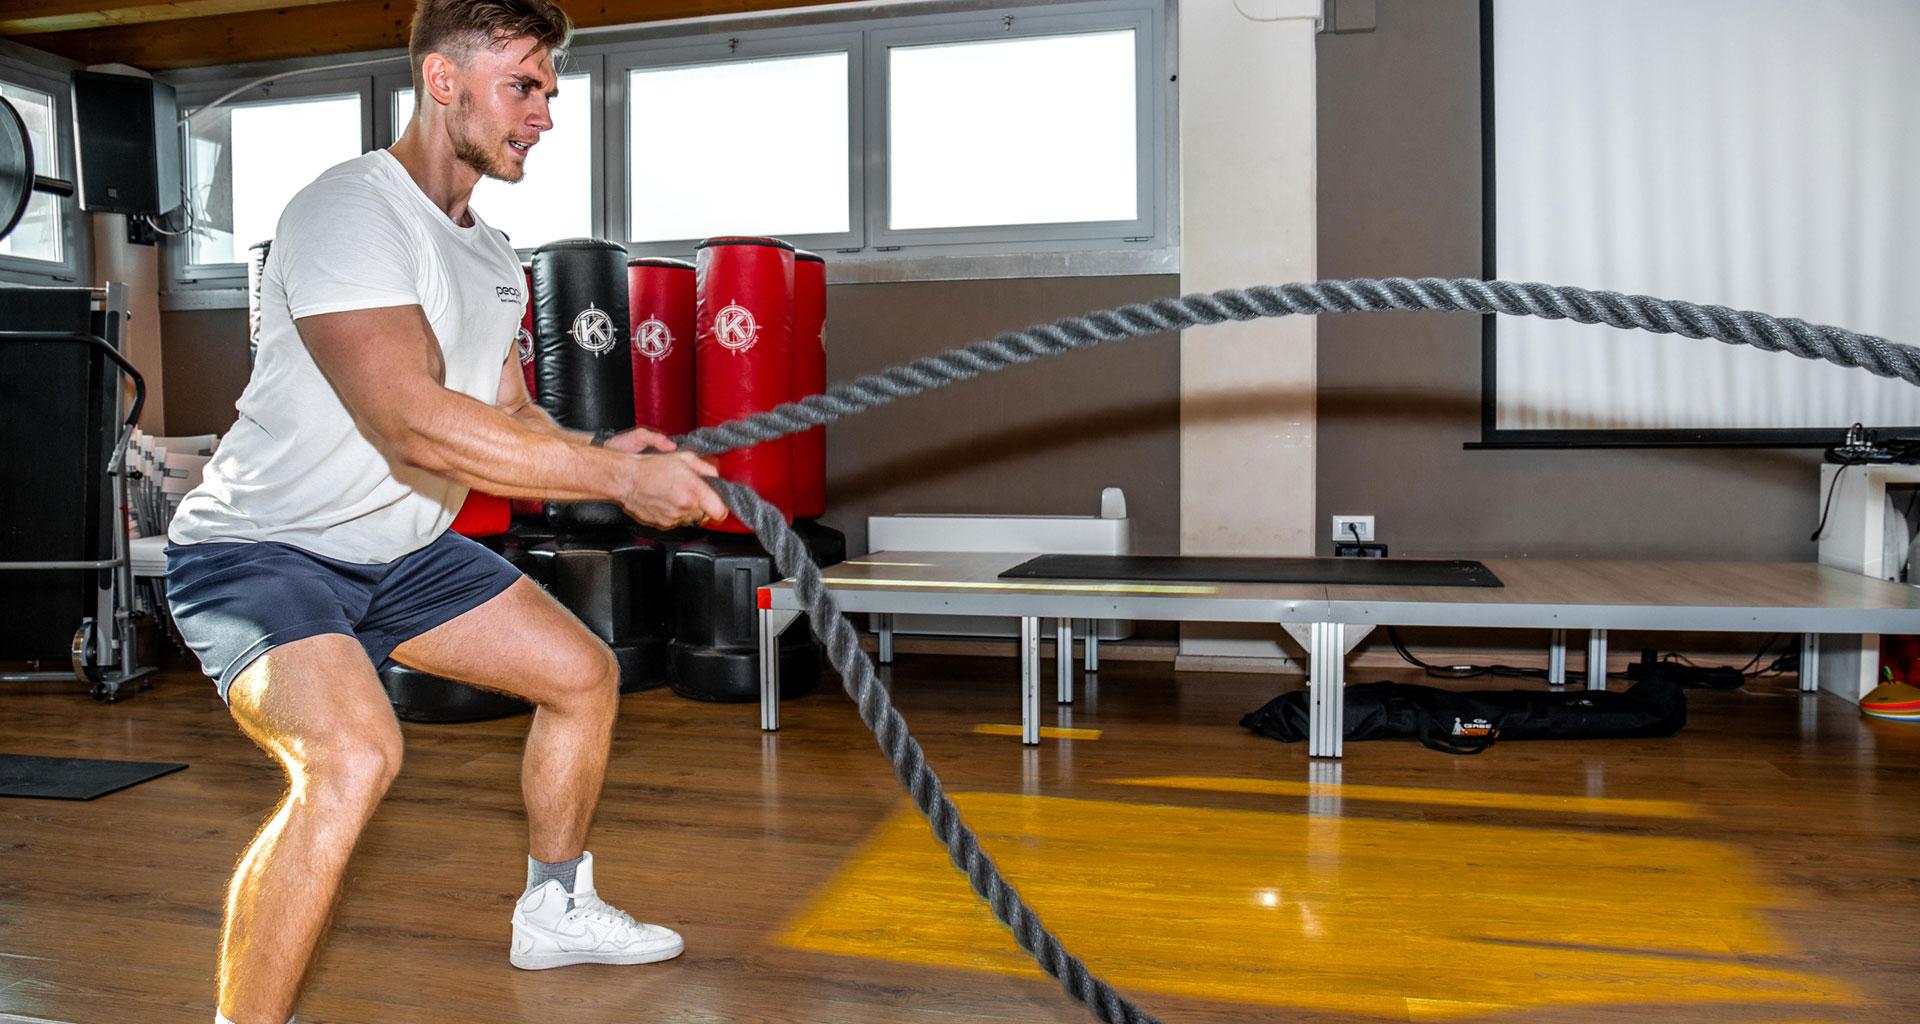 Palestra People Monselice Ampia Sala Attrezzata Personal Trainer Corsi Fitness